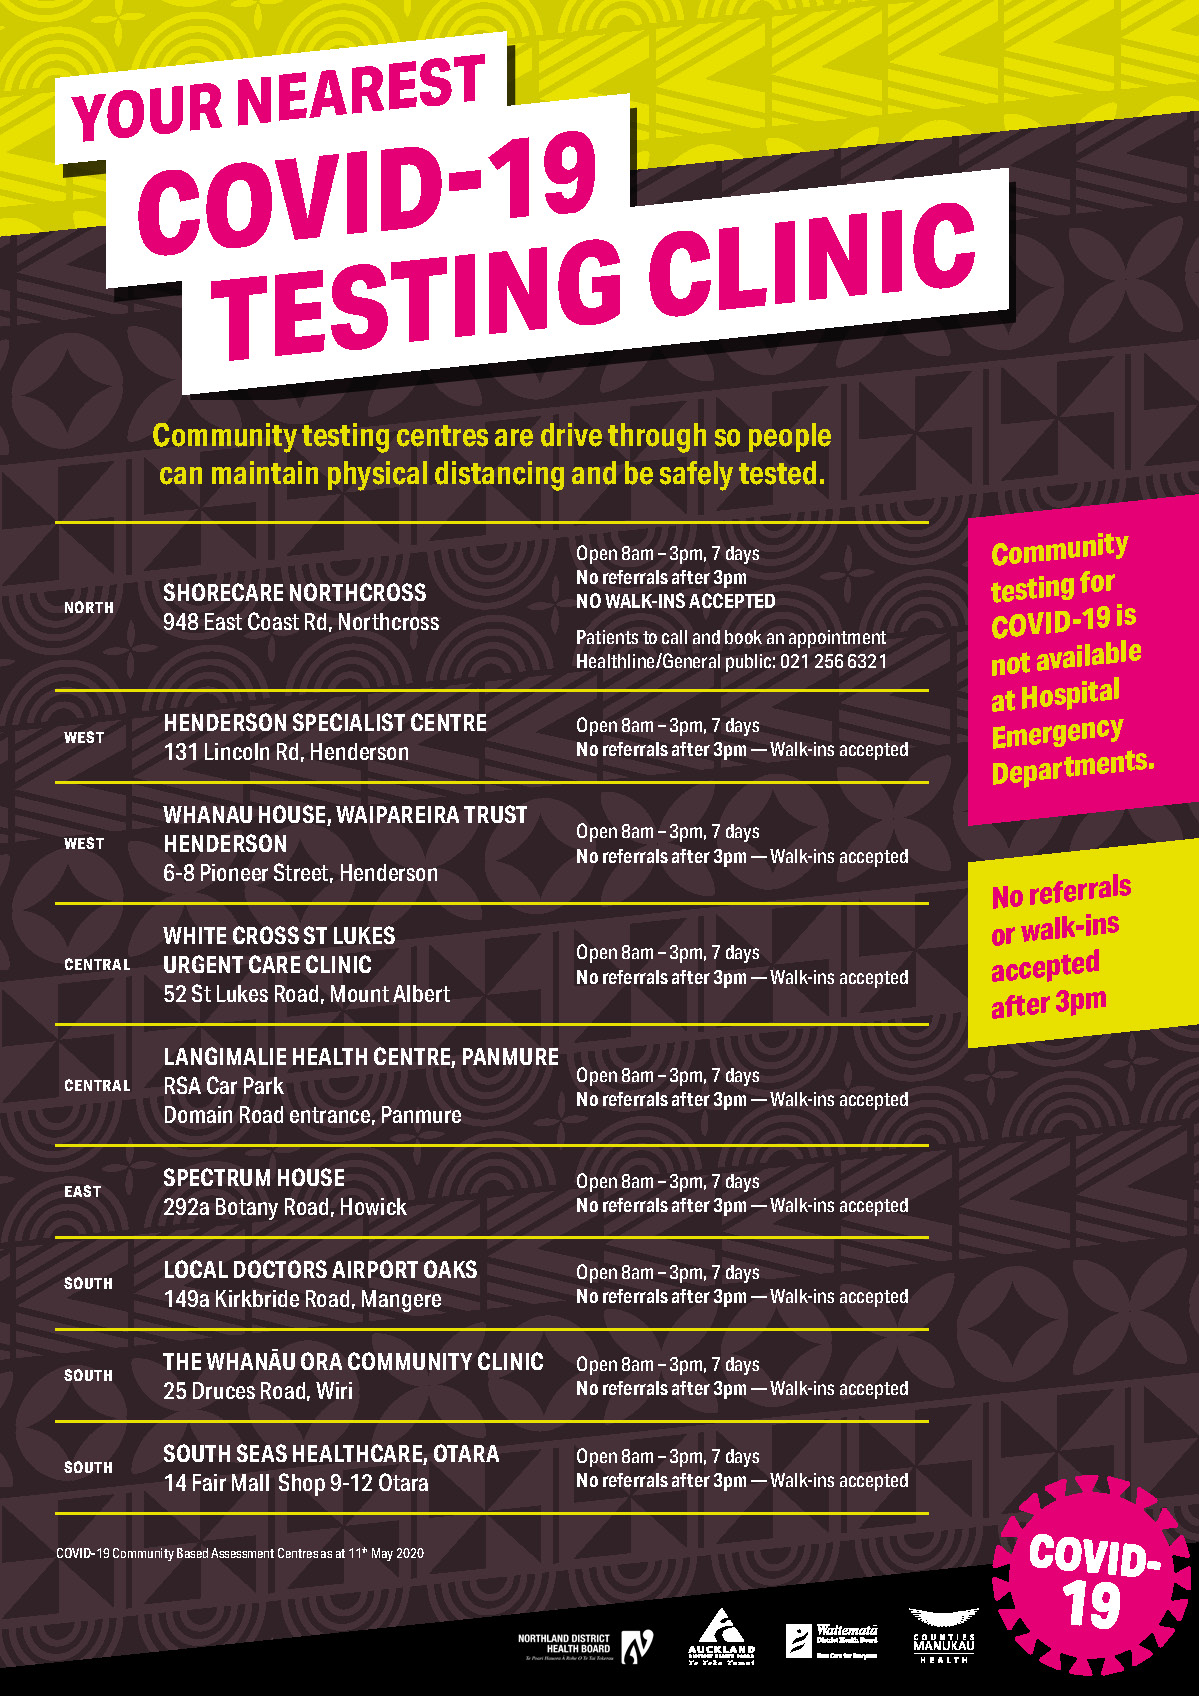 List_COVID-19_Testing Clinic-sites-Auckland.jpg